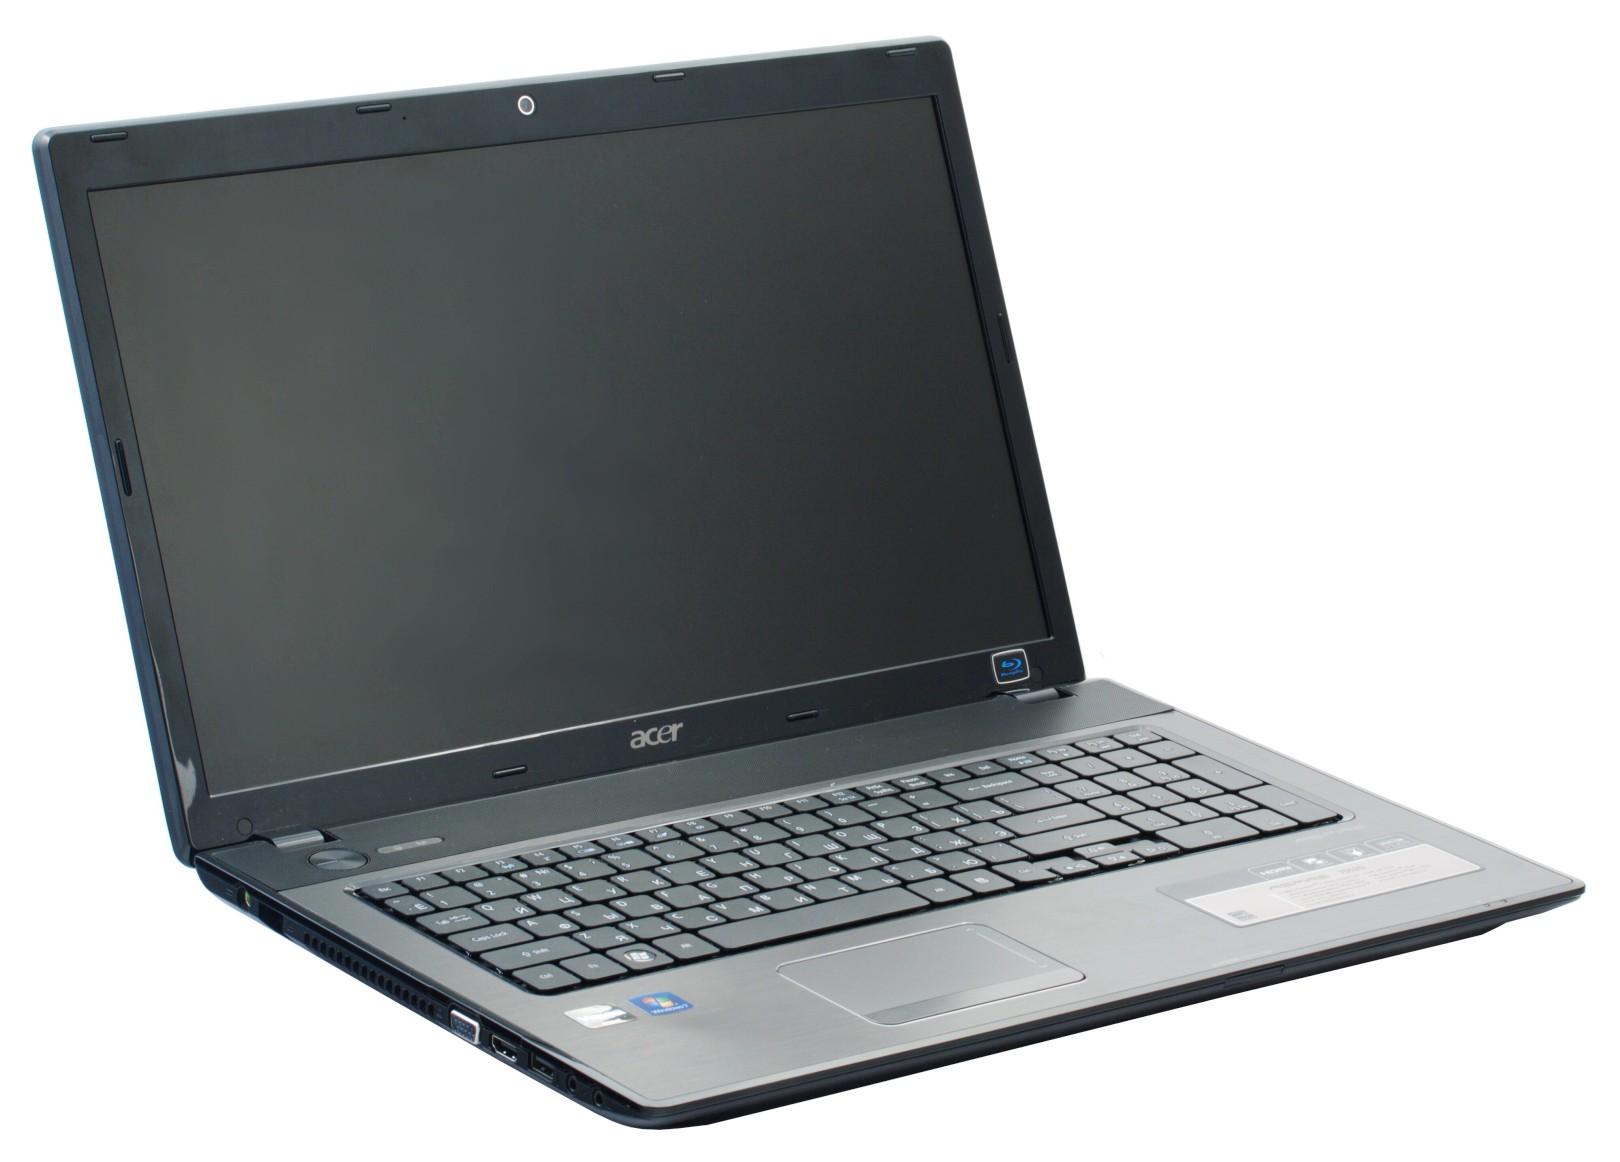 Ноутбук Acer Aspire A315-51-31DY NX.GNPER.005 (Intel Core i3-6006U 2.0 GHz/4096Mb/500Gb/Intel HD Graphics 520/Wi-Fi/Bluetooth/Cam/15.6/1366x768/Windows 10)